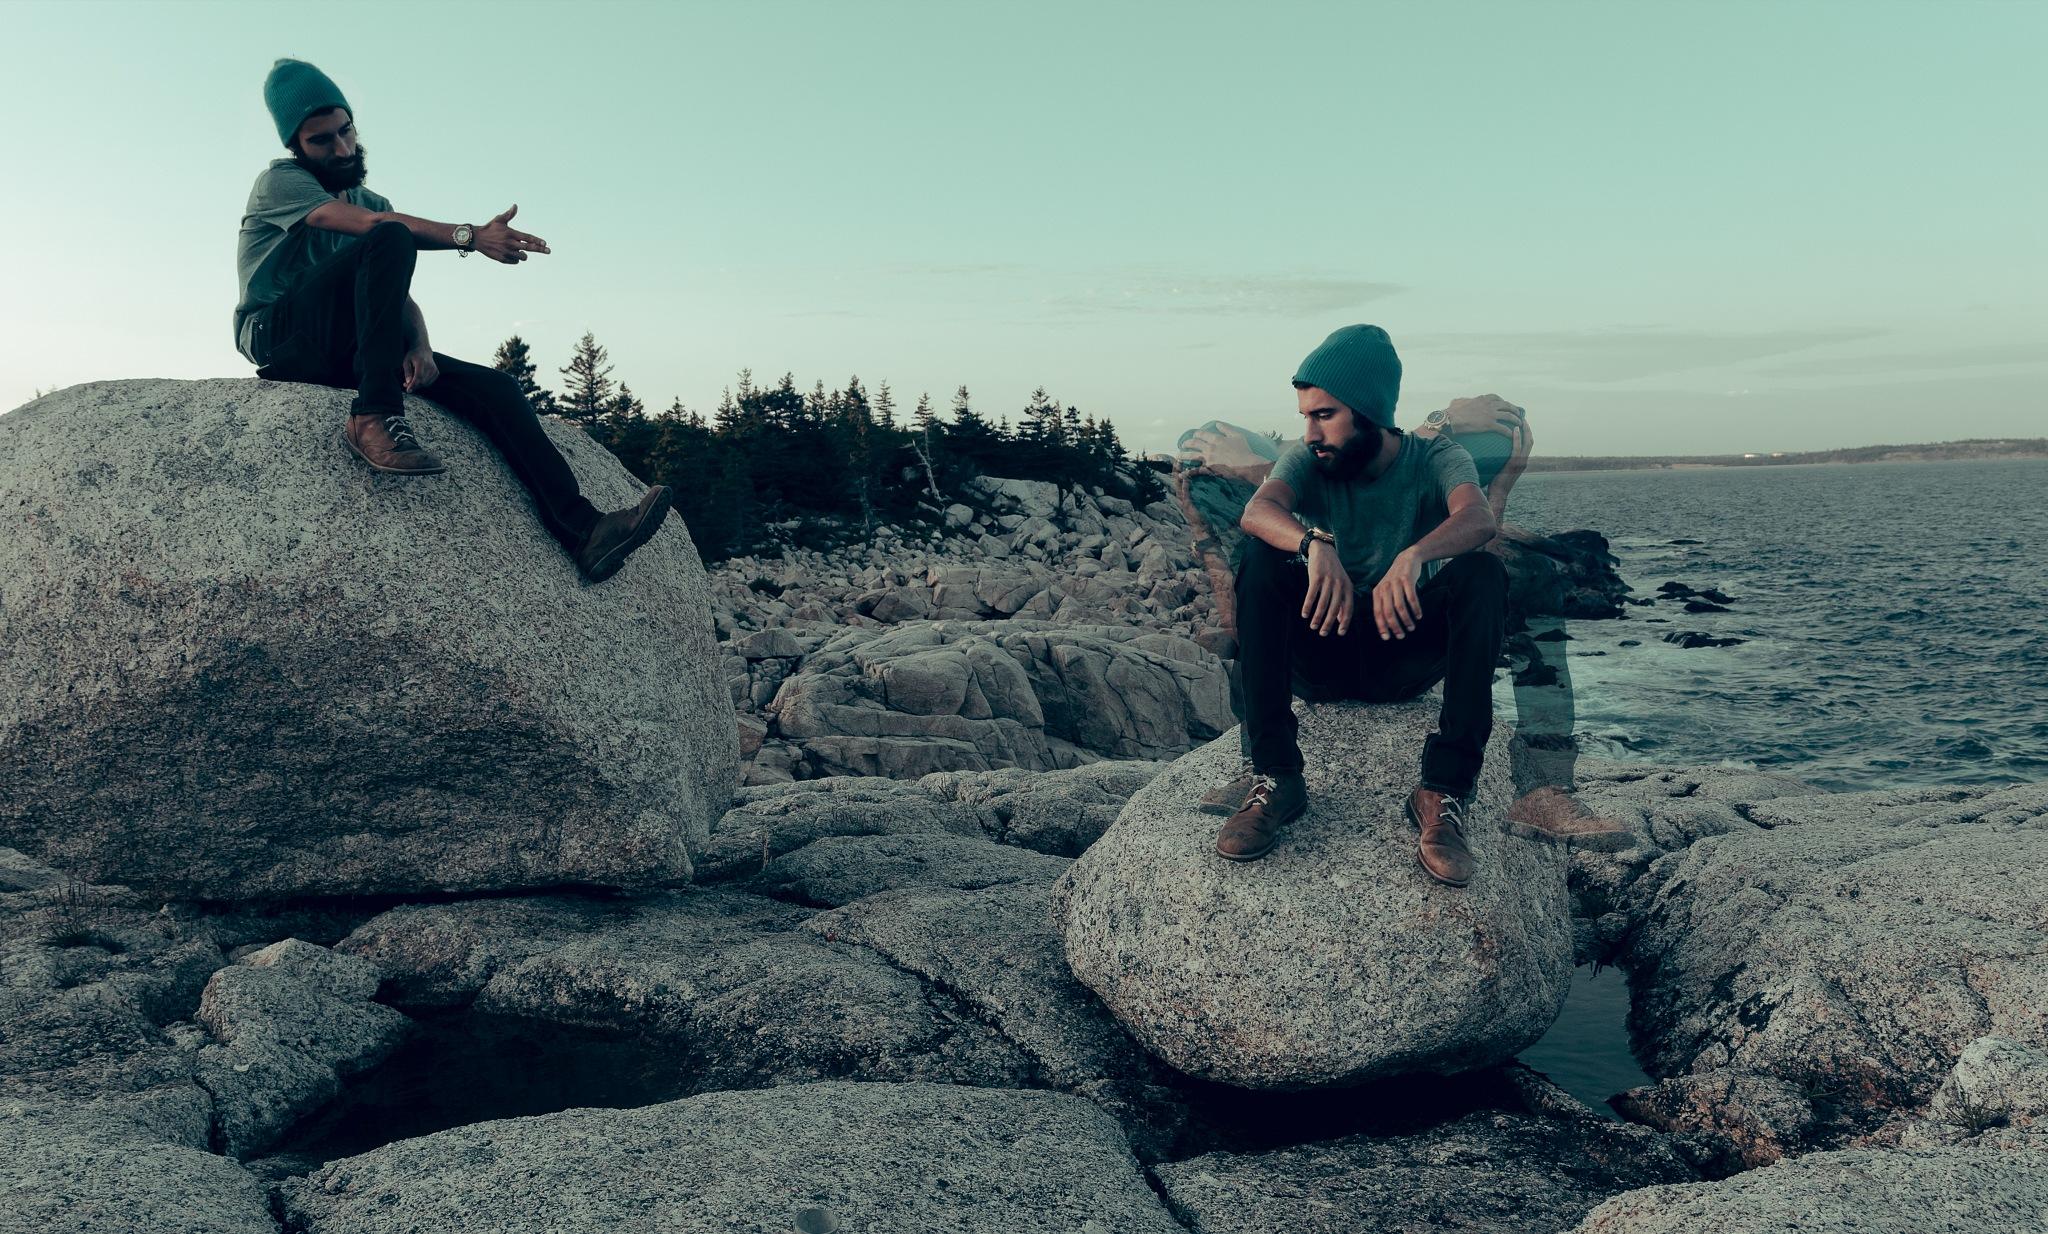 Suicidal Headcase by Sean LeBlanc